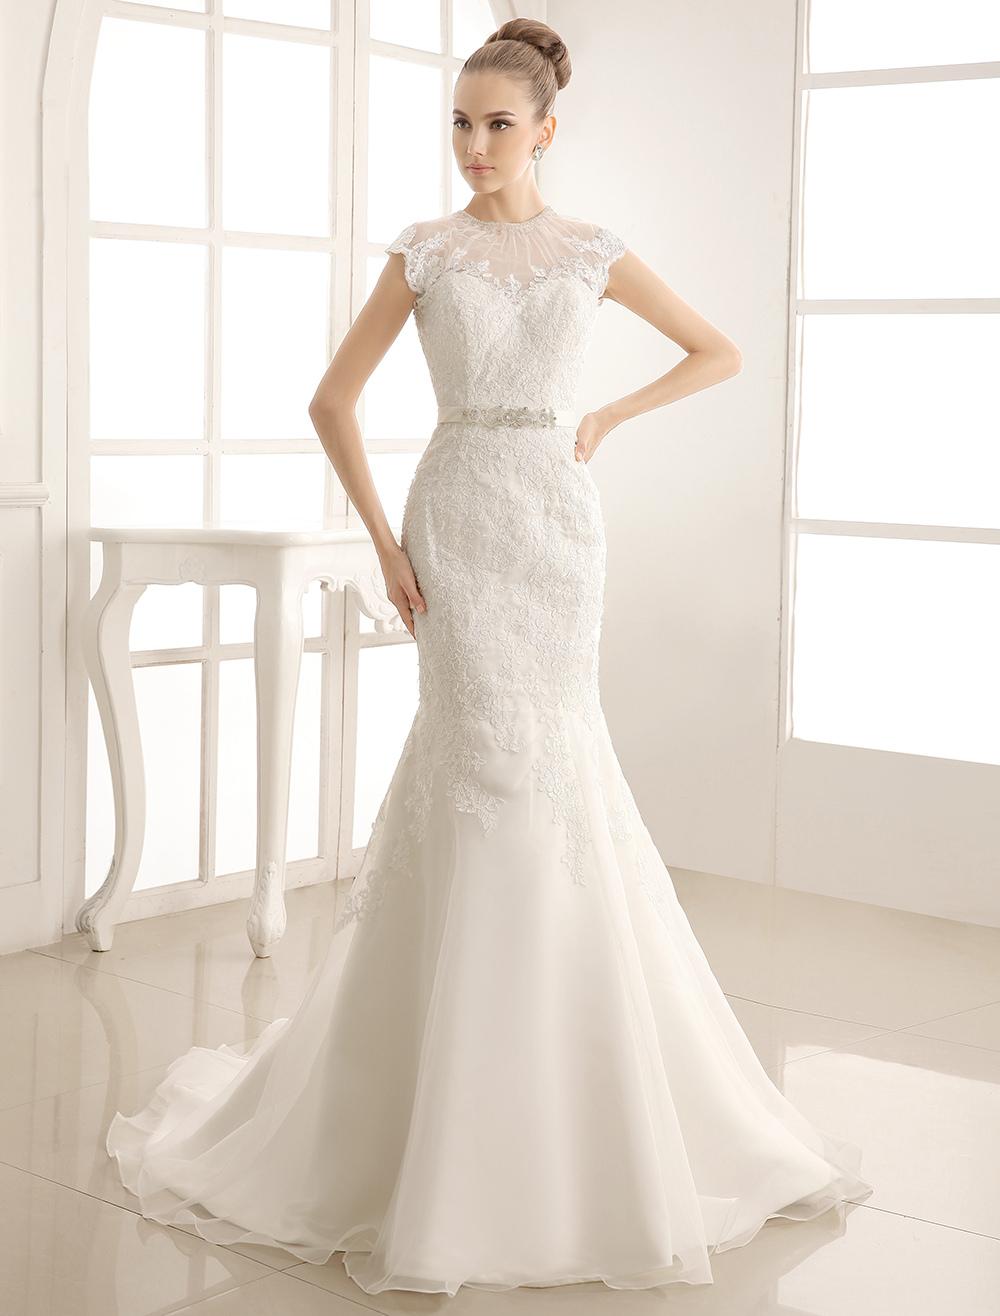 High Collar Lace Brides Wedding Dress With Beading Sash Milanoo